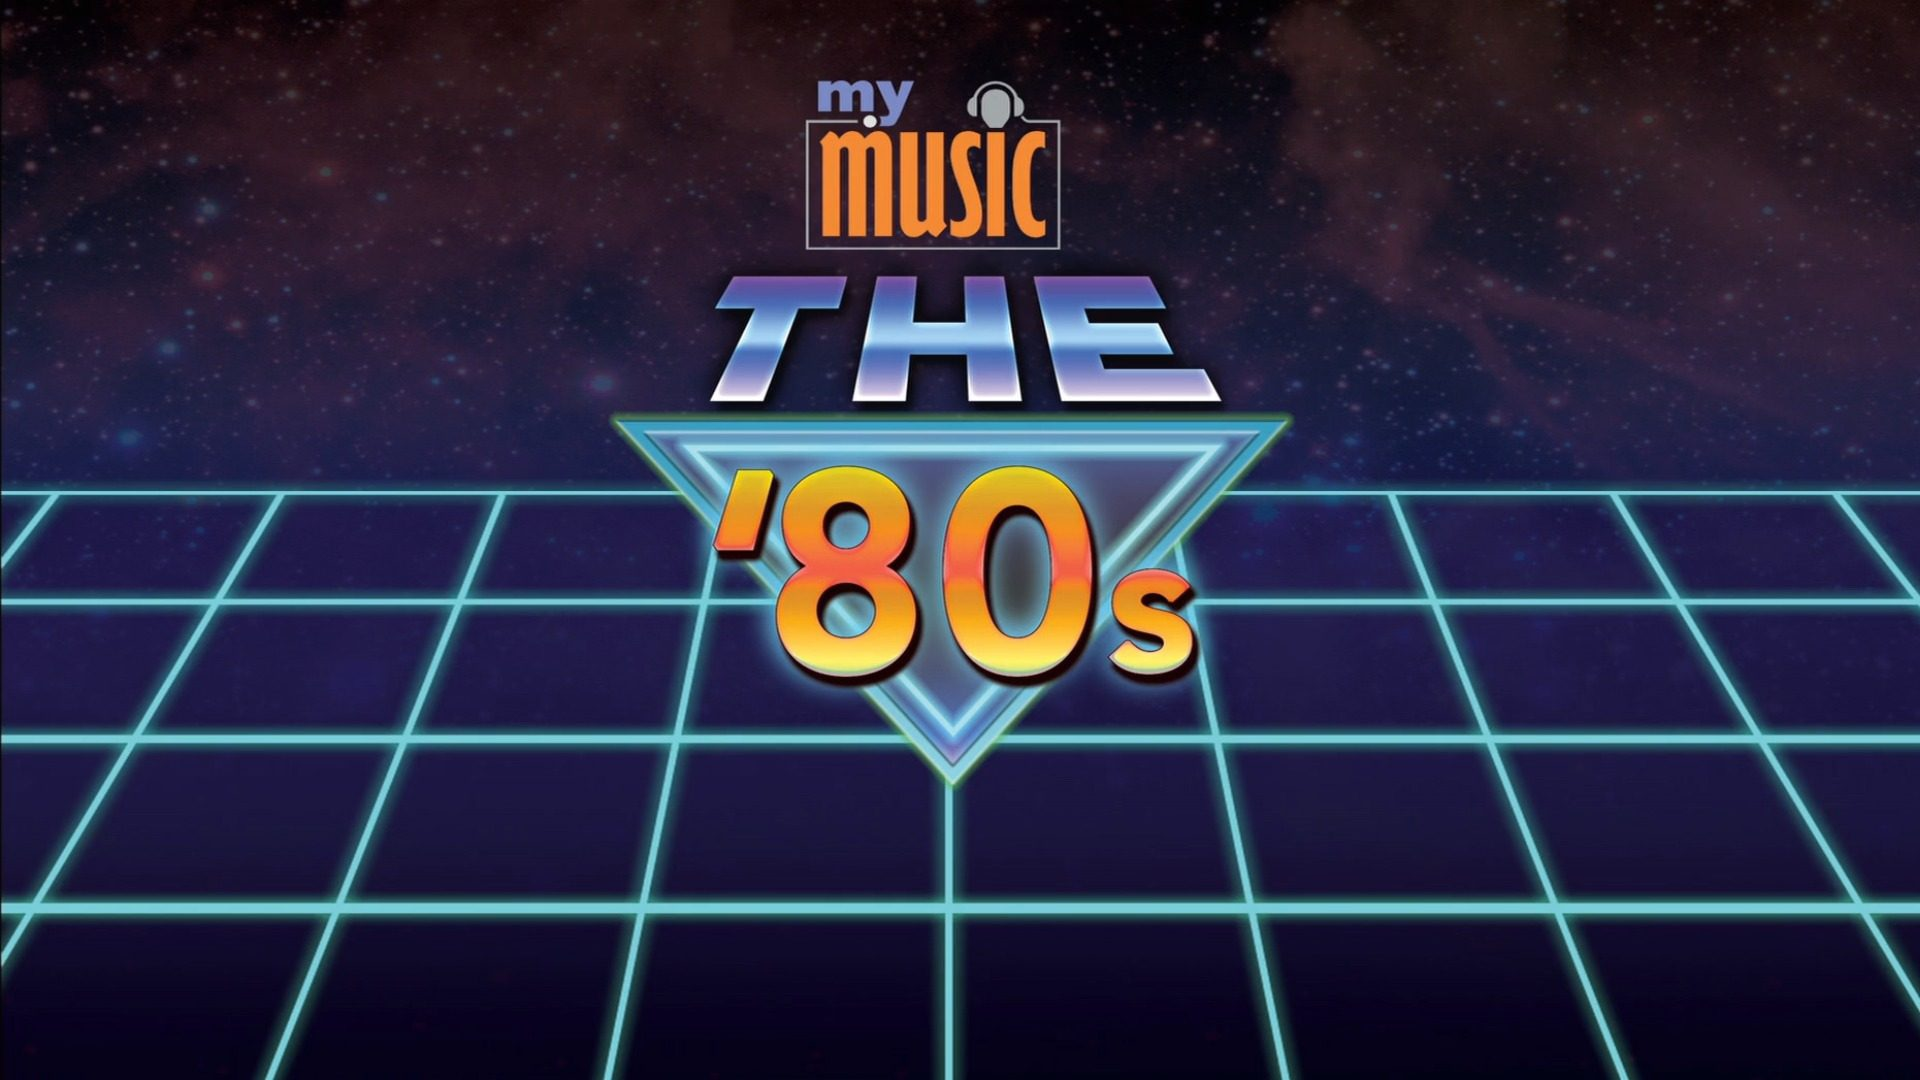 My Music: The '80s (2017) - IMDb